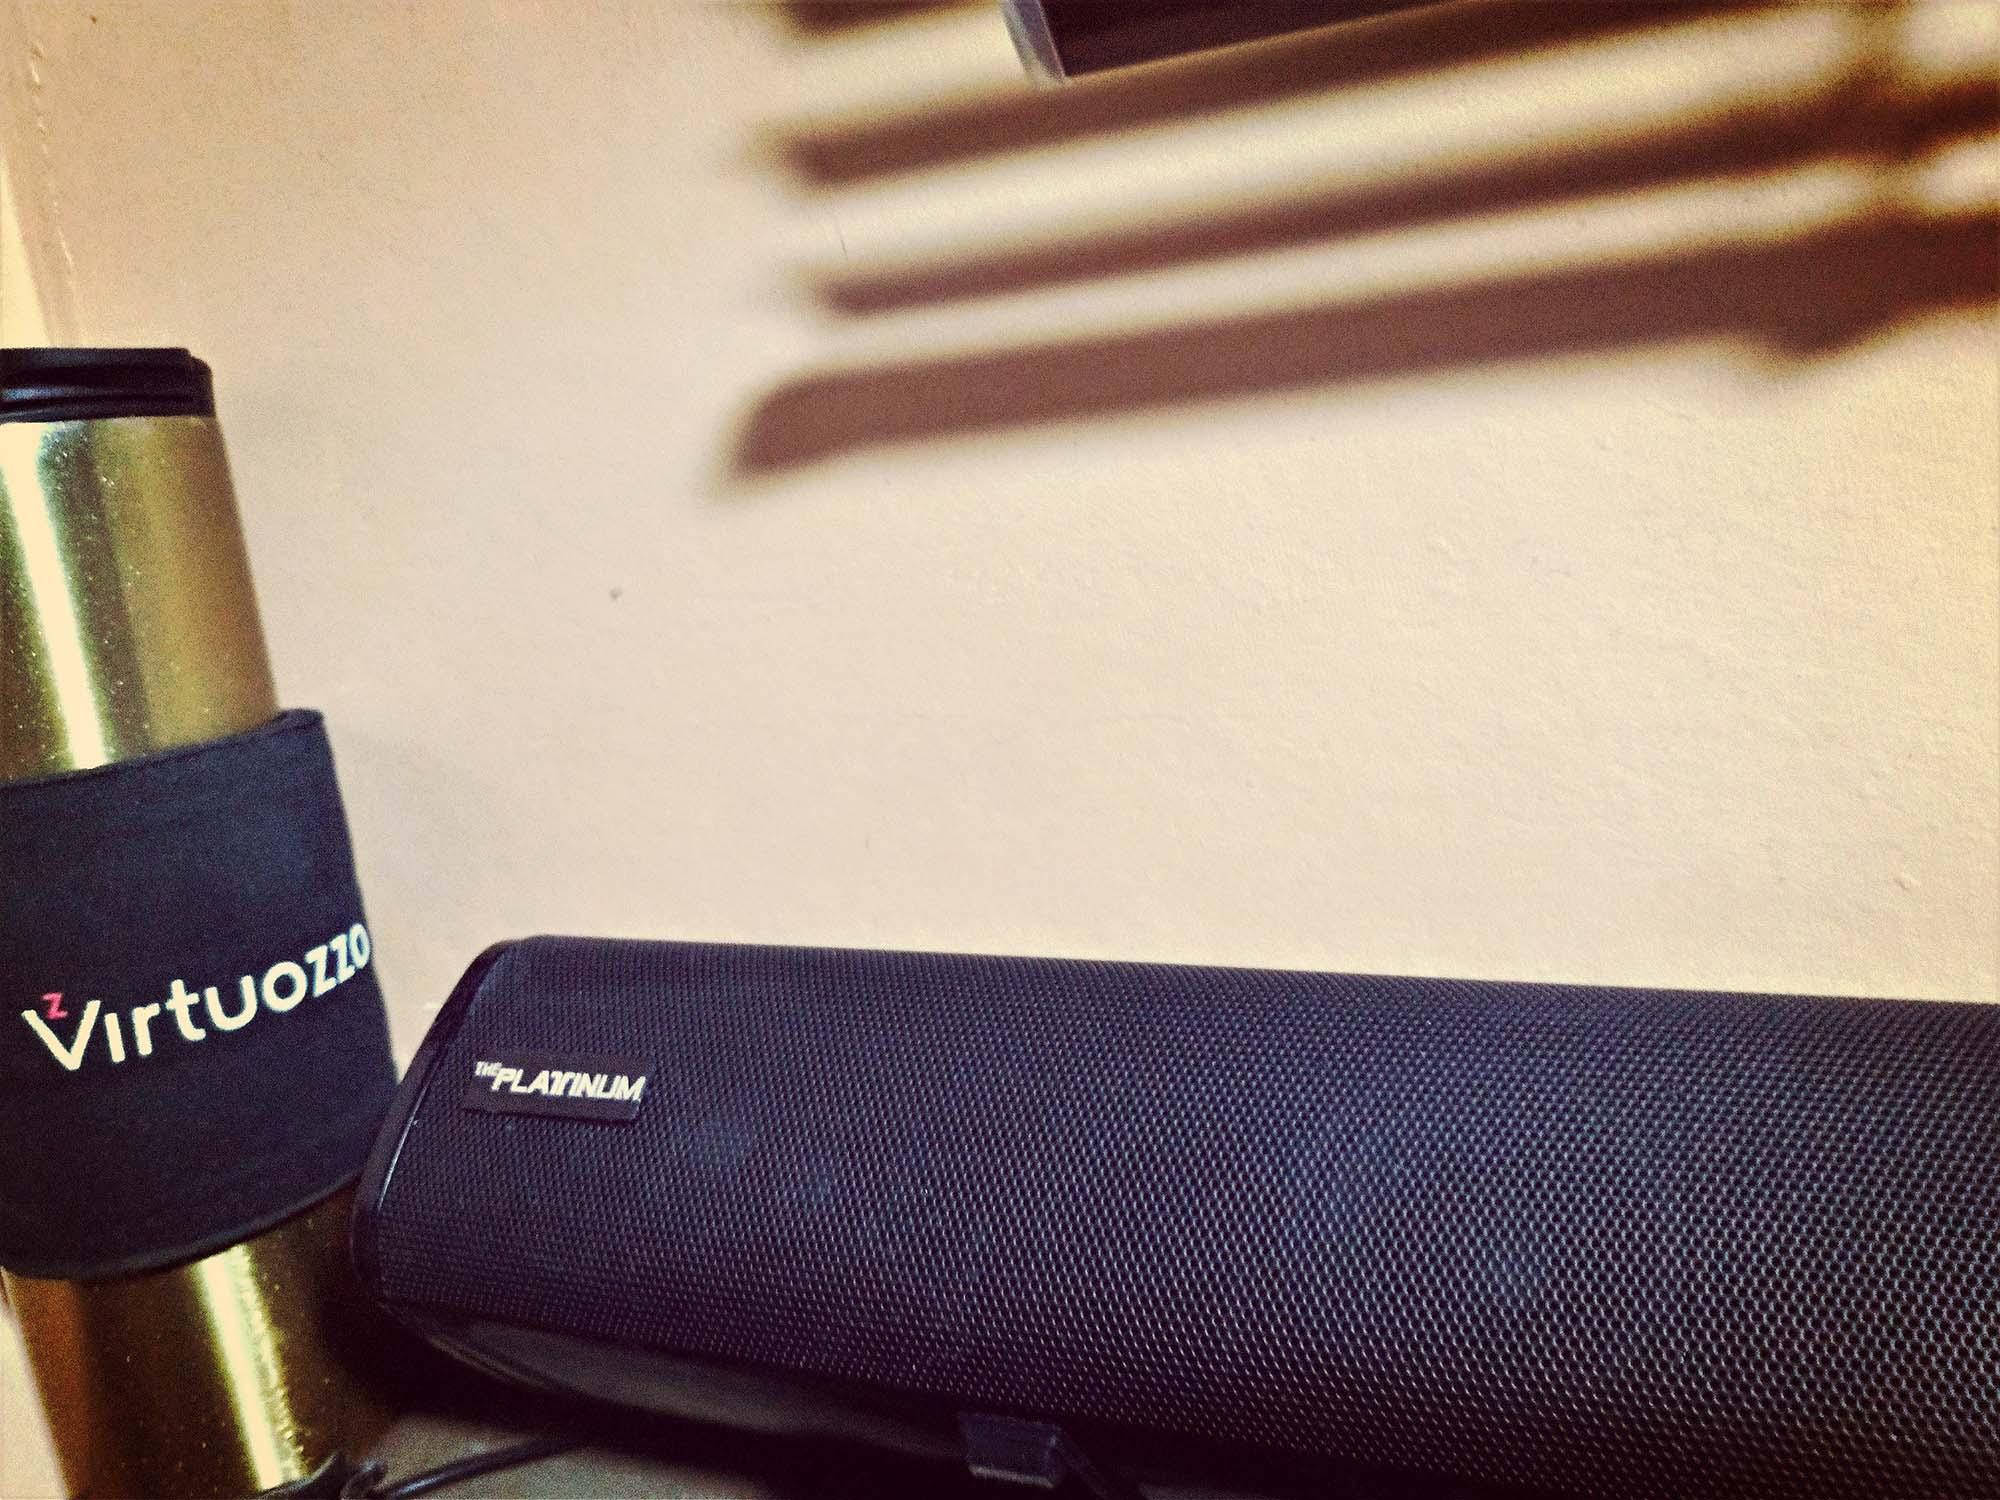 Product Review: Platinum Soundbar PTSB 80W